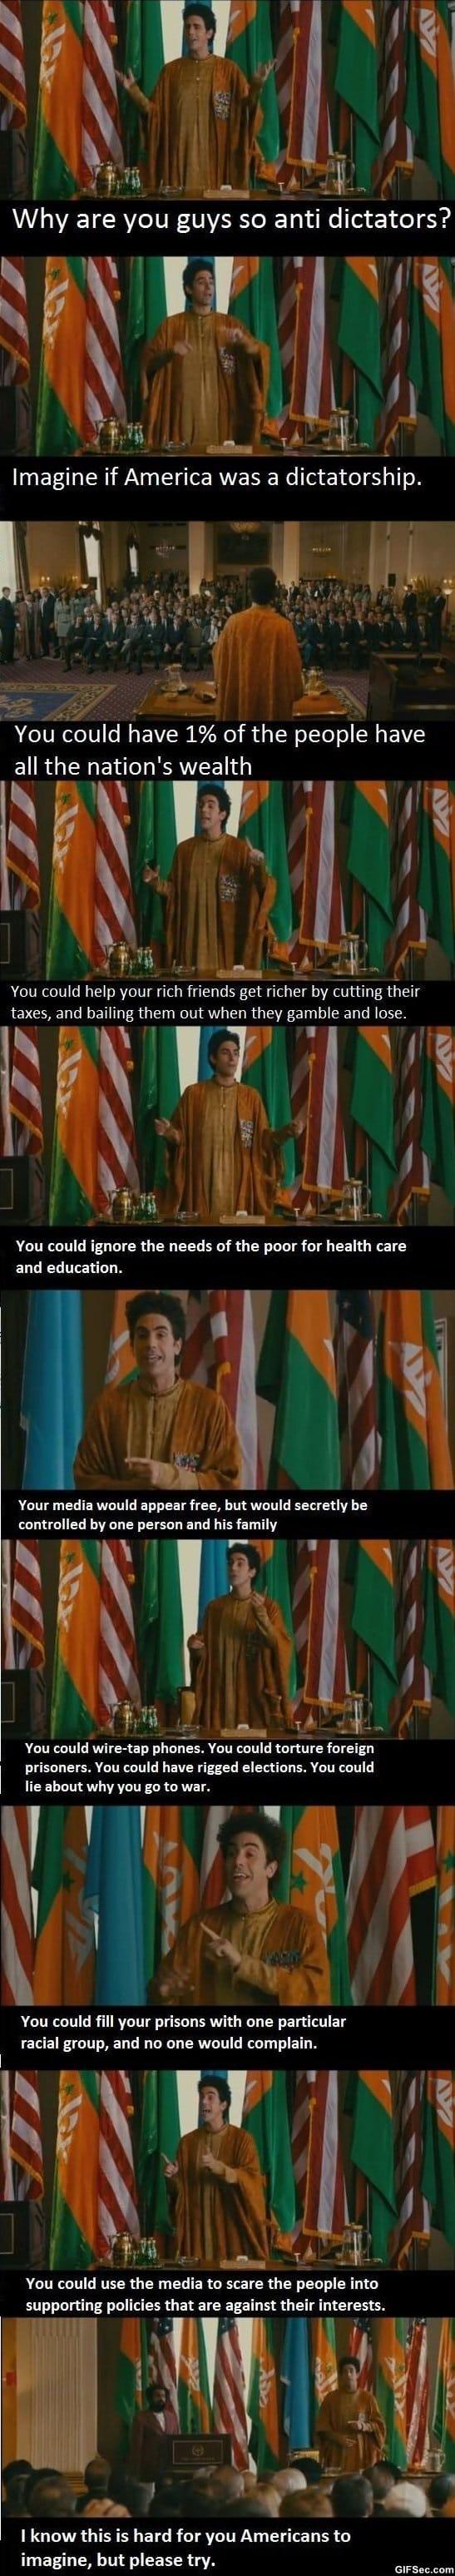 funny-imagine-if-america-was-a-dictatorship